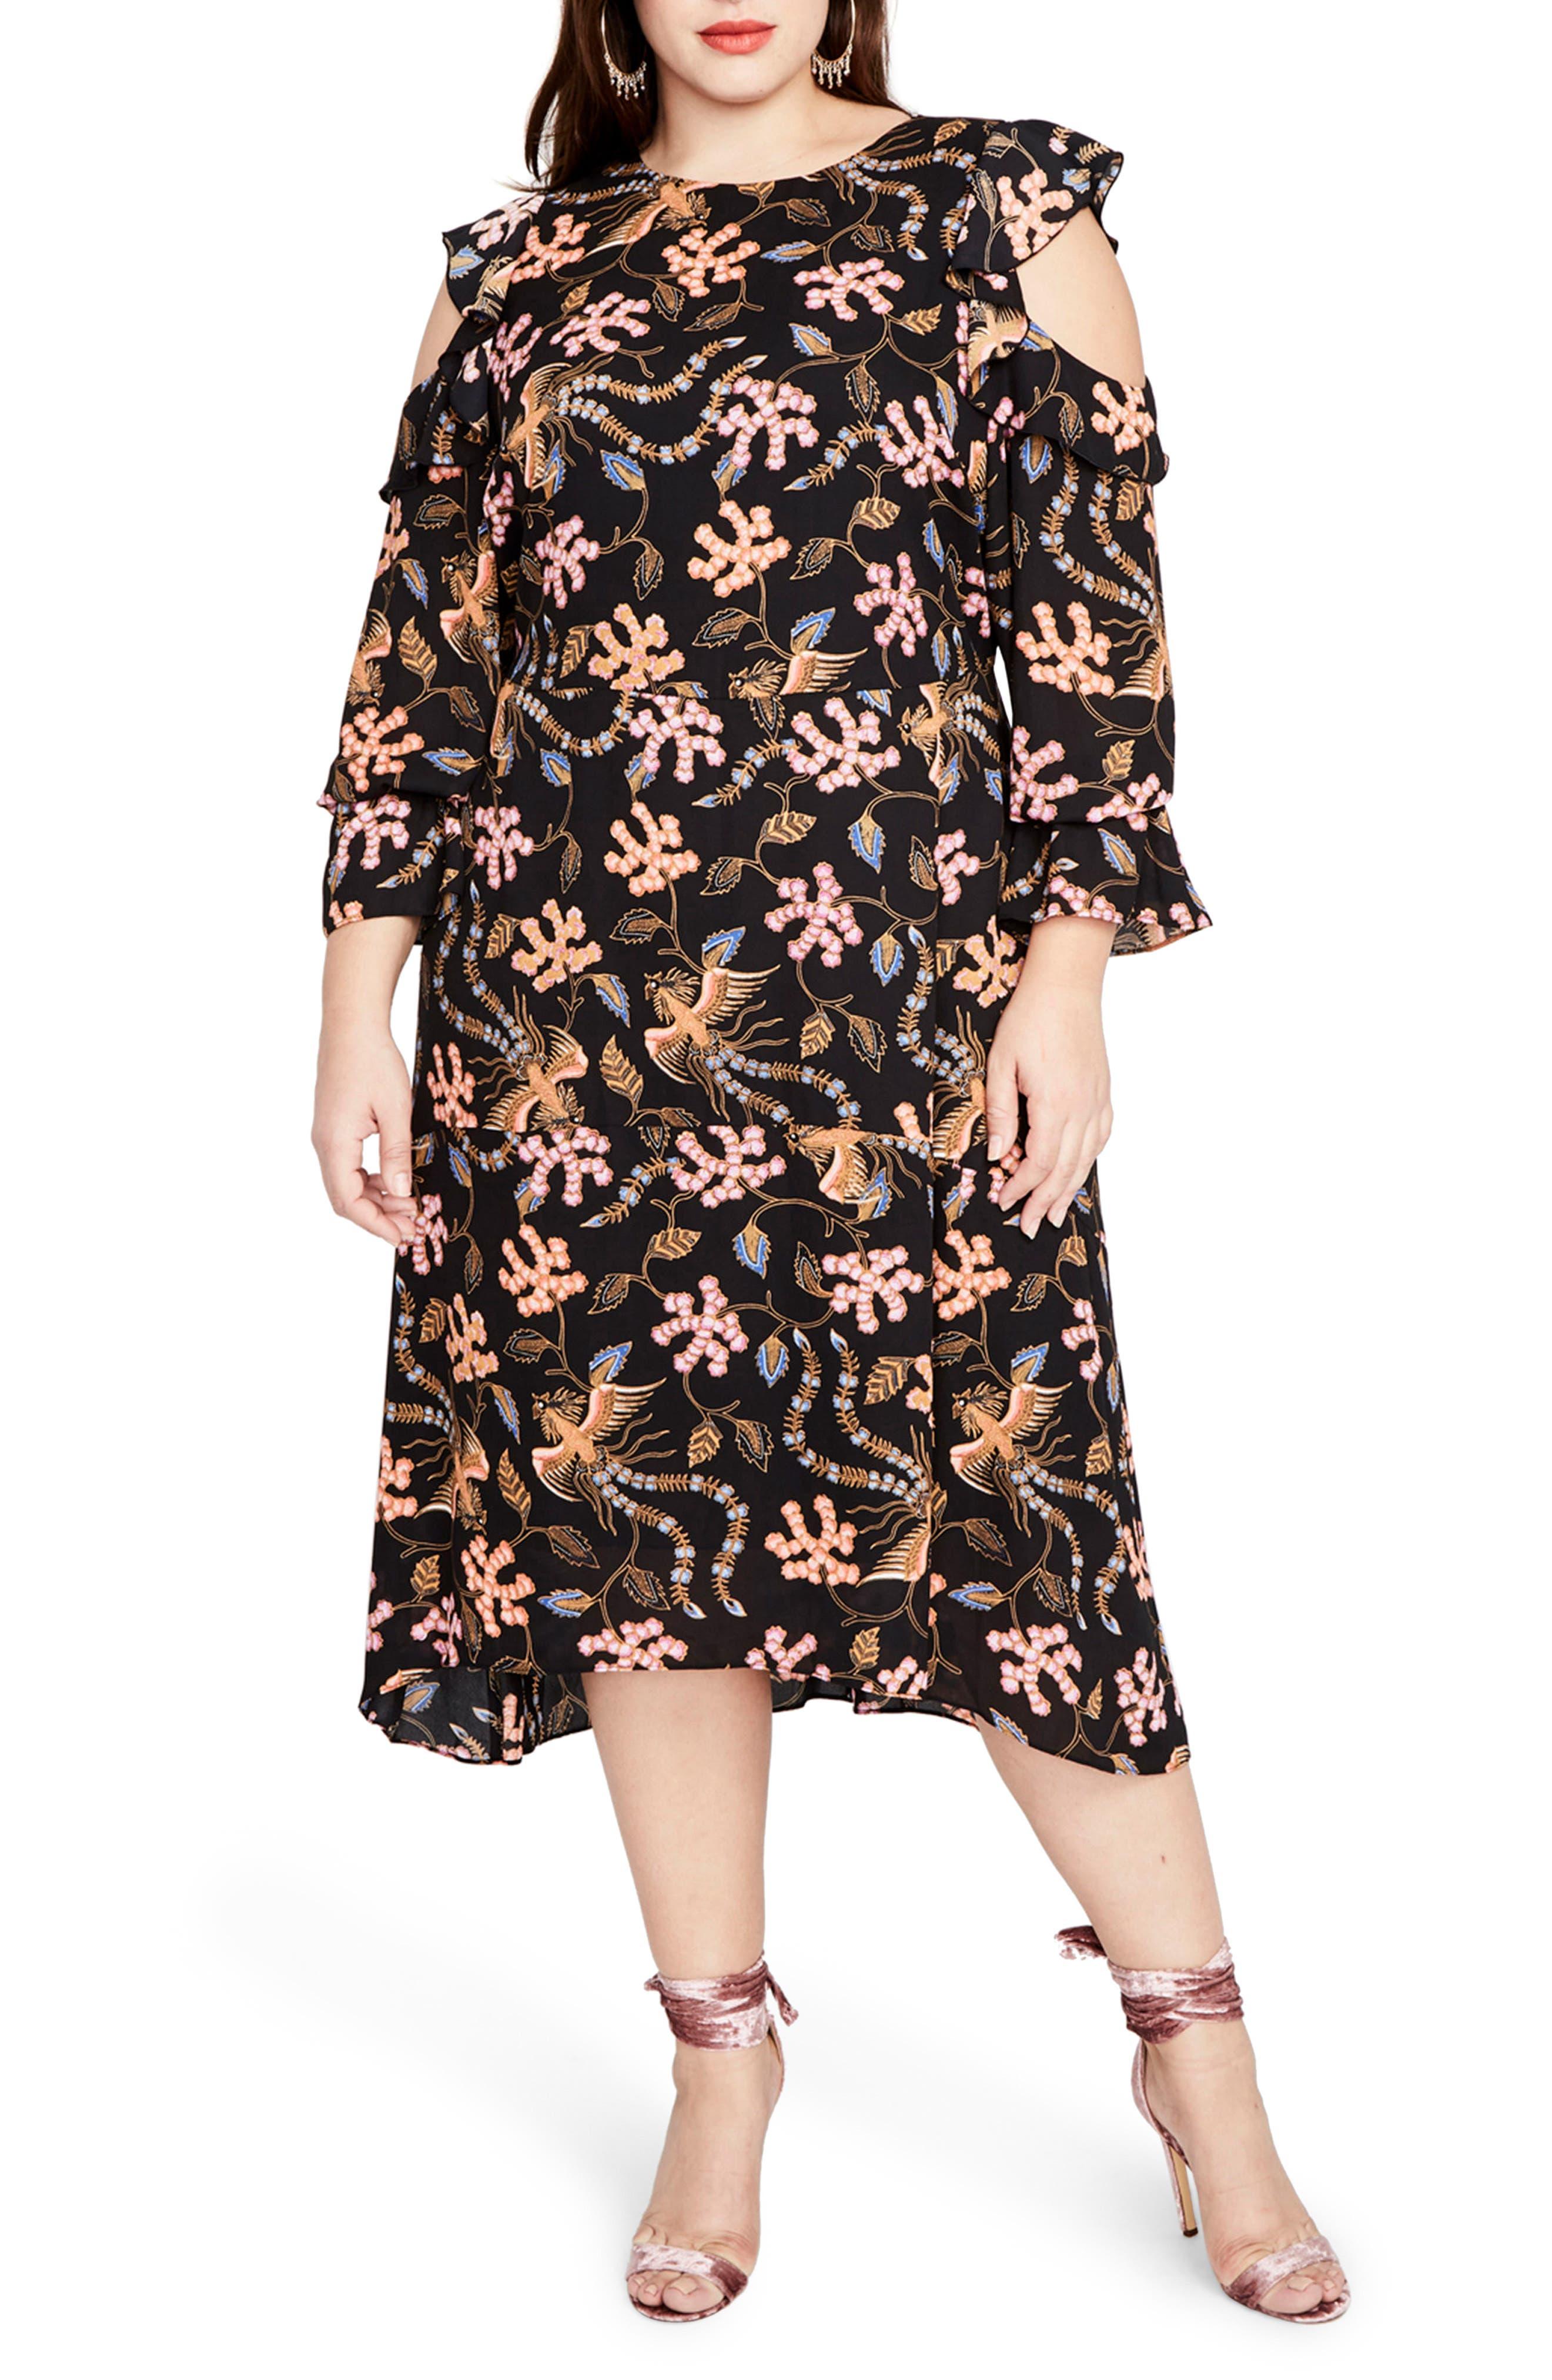 RACHEL BY Rachel Roy Cold Shoulder Ruffle Midi Dress,                         Main,                         color, 012